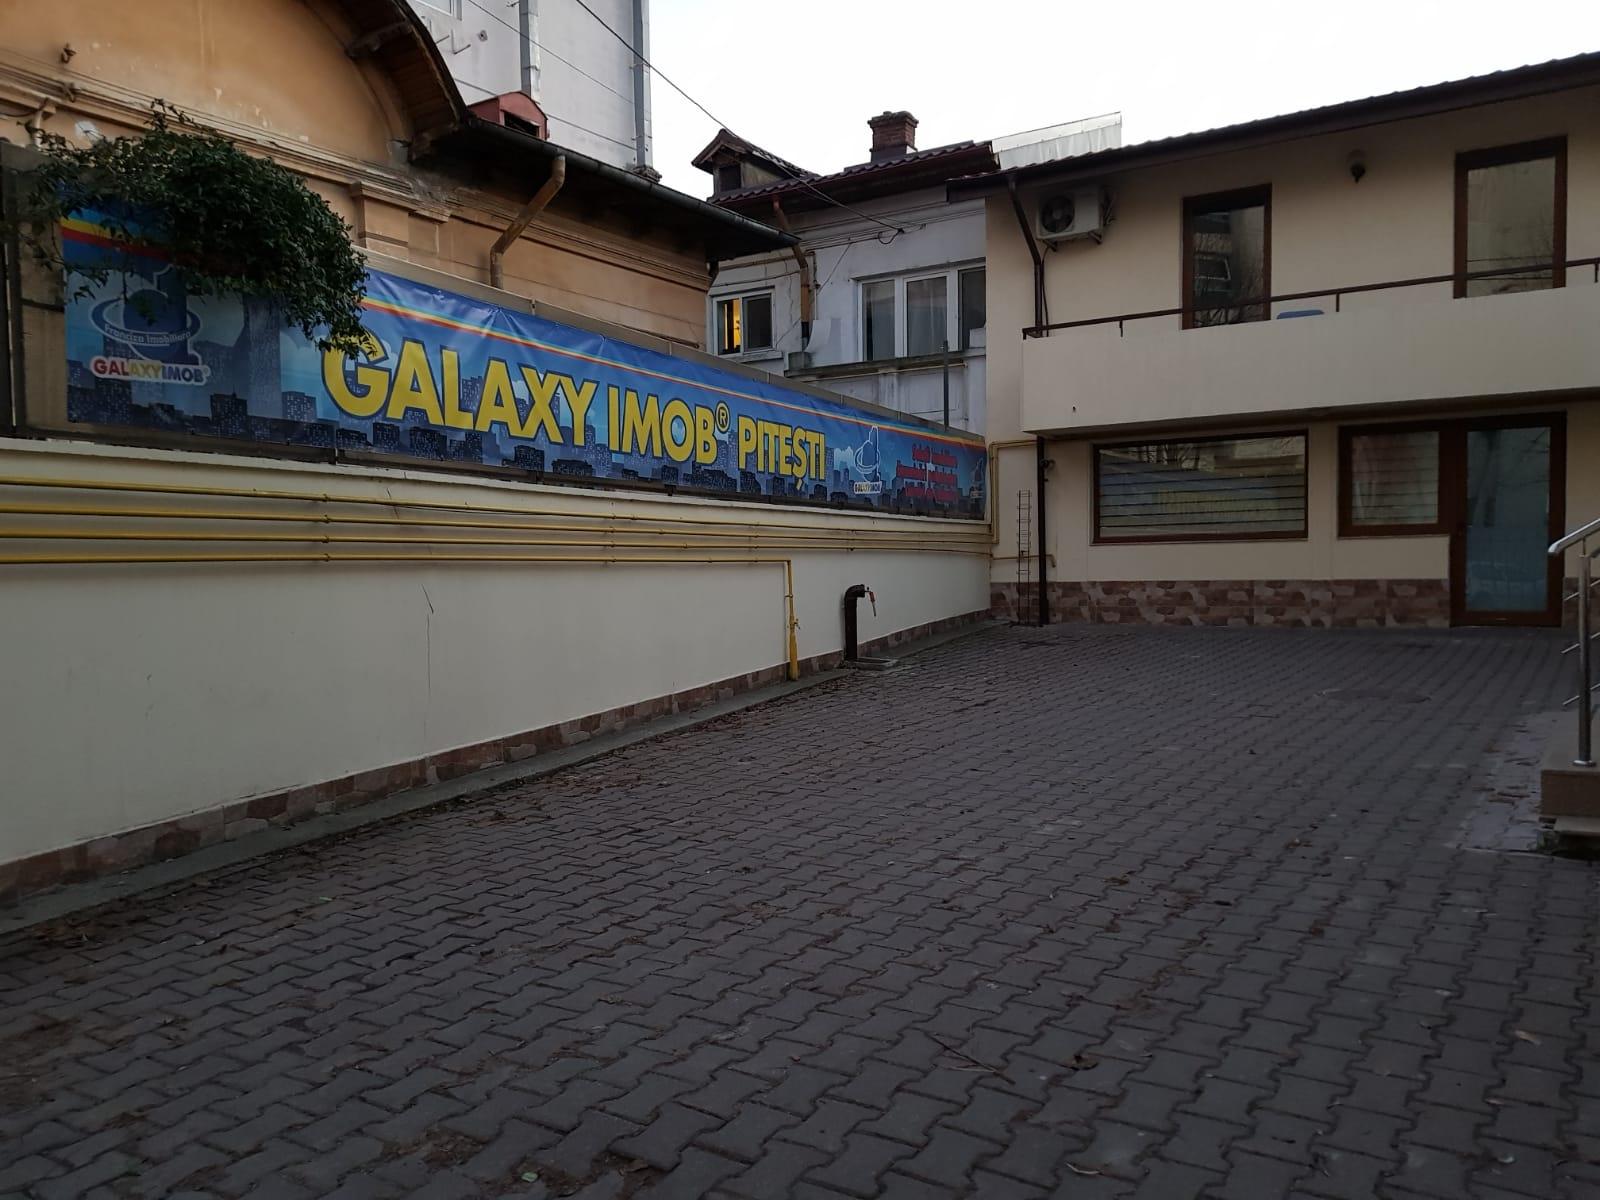 GALAXY IMOB PITESTI